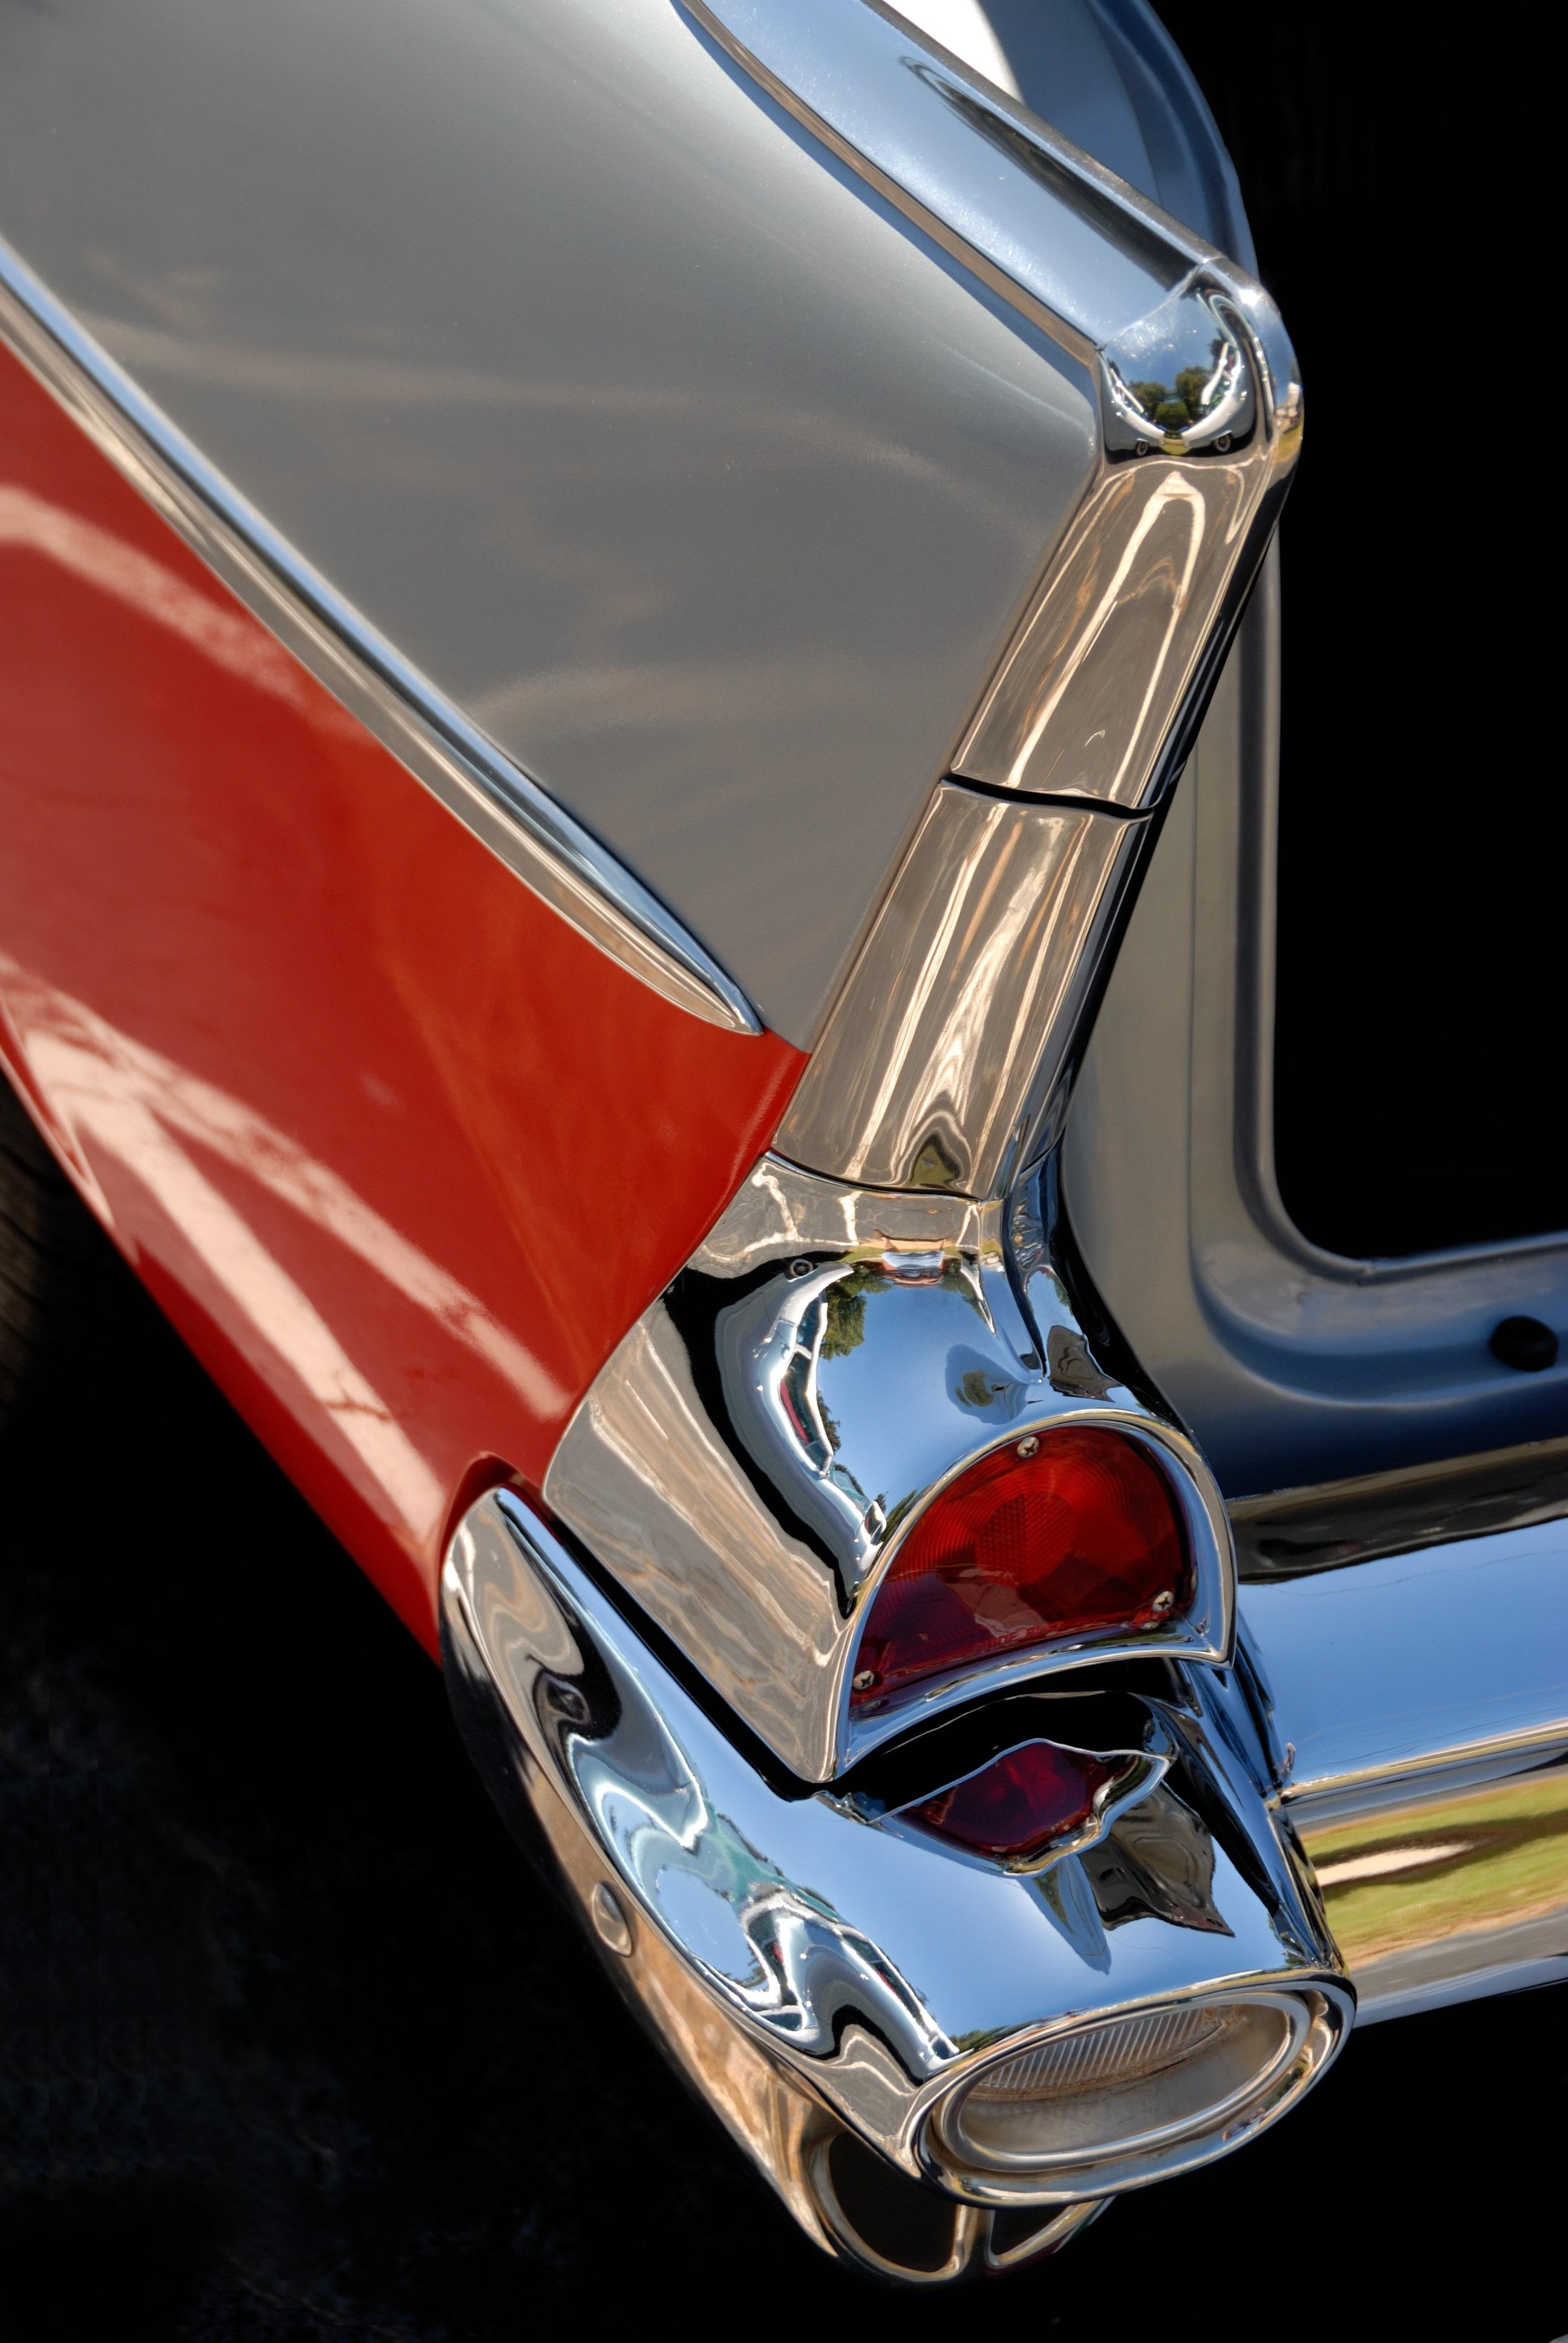 Free Images : antique, wheel, retro, window, glass, old ...